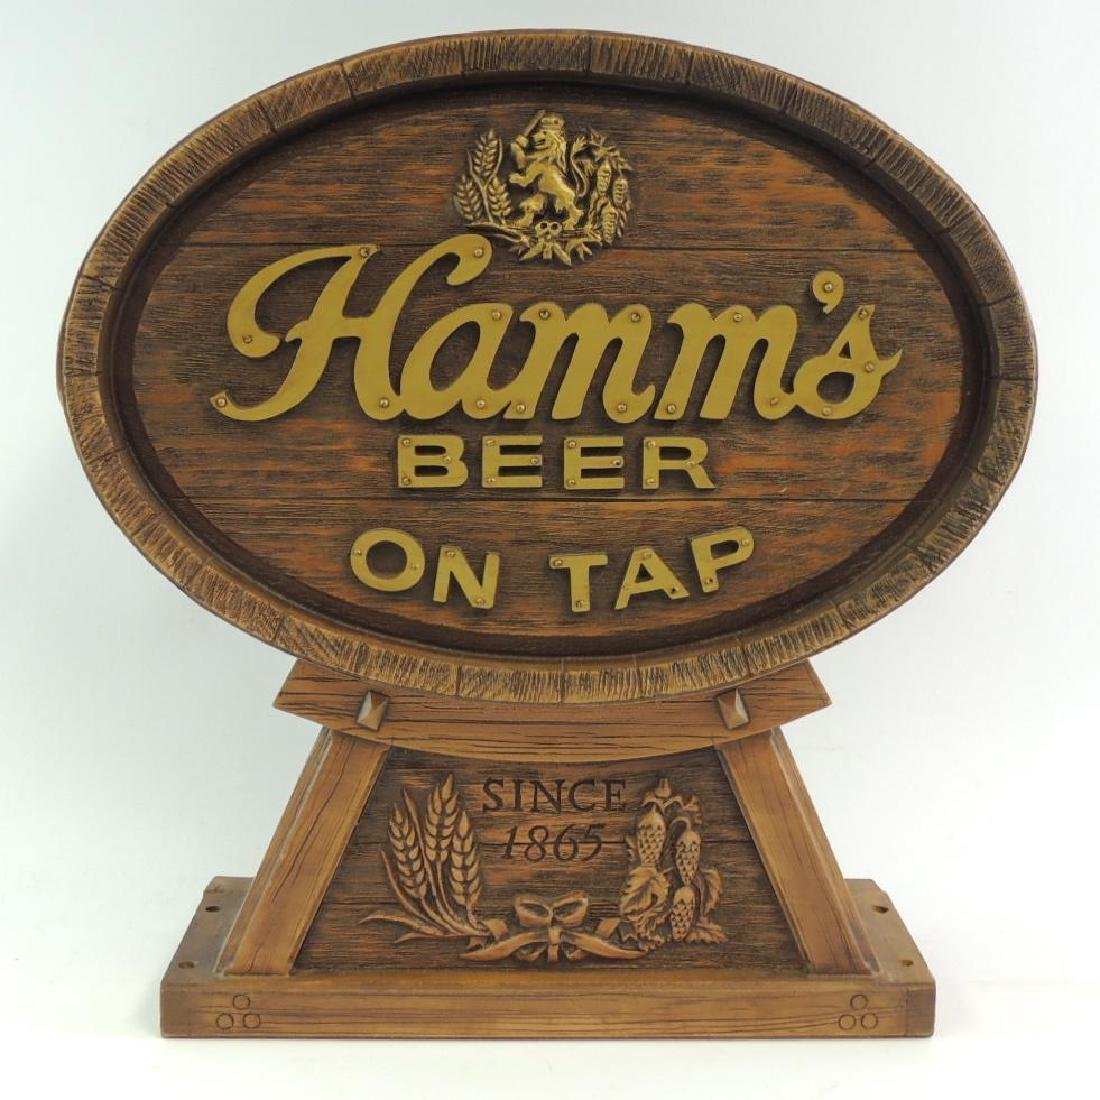 Hamm's Beer On Tap Advertising End Cap Barrel Topper